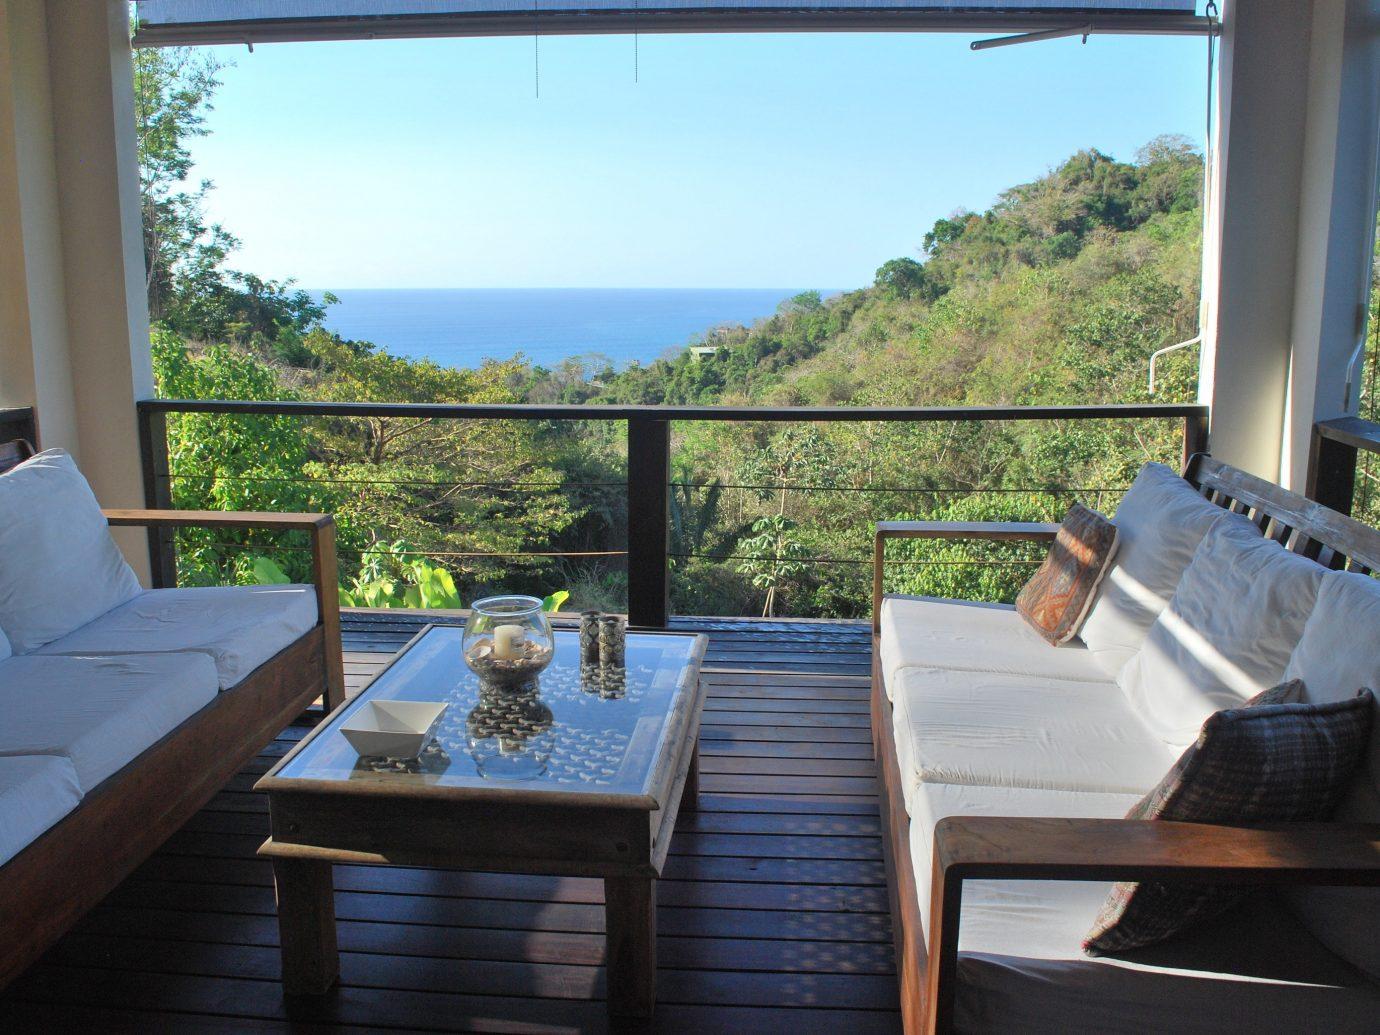 Outdoor breakfast at Casa Frangipani in Costa Rica